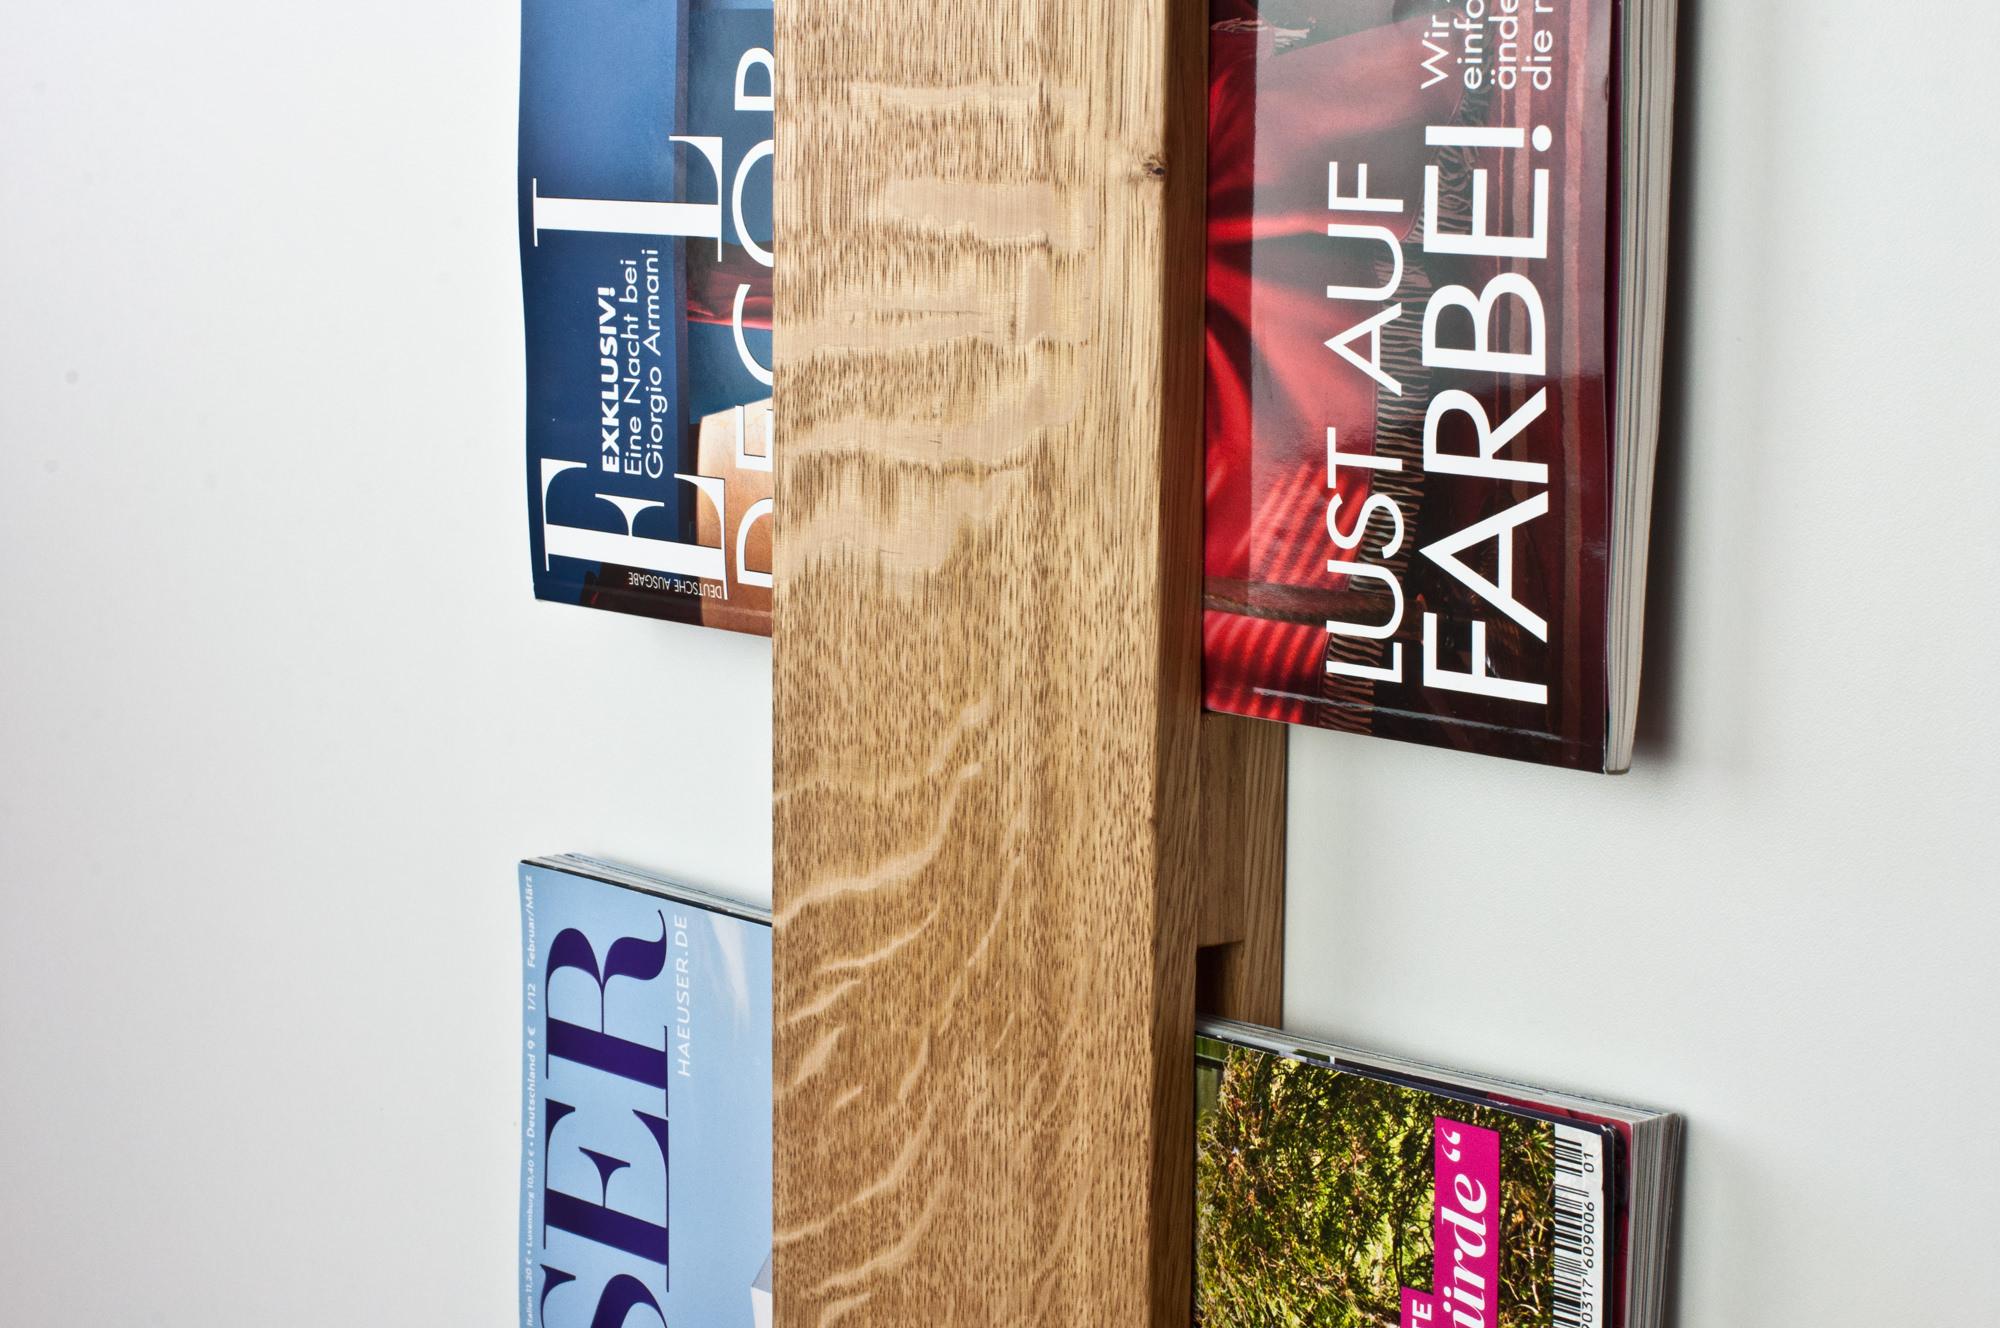 zeitschriftenhalter magazin klotzaufklotz exzellente. Black Bedroom Furniture Sets. Home Design Ideas